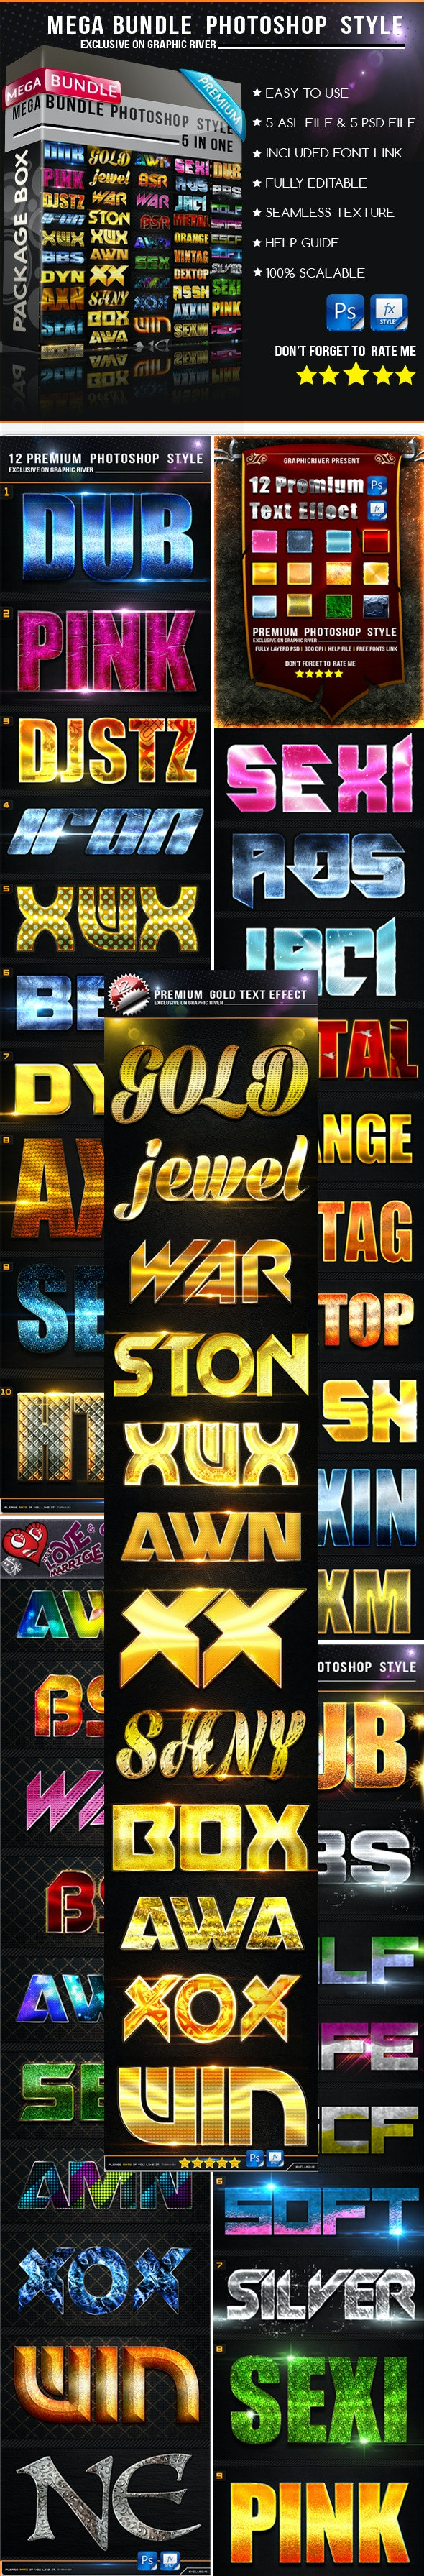 Mega Bundle Photoshop Style v2 - Text Effects Styles